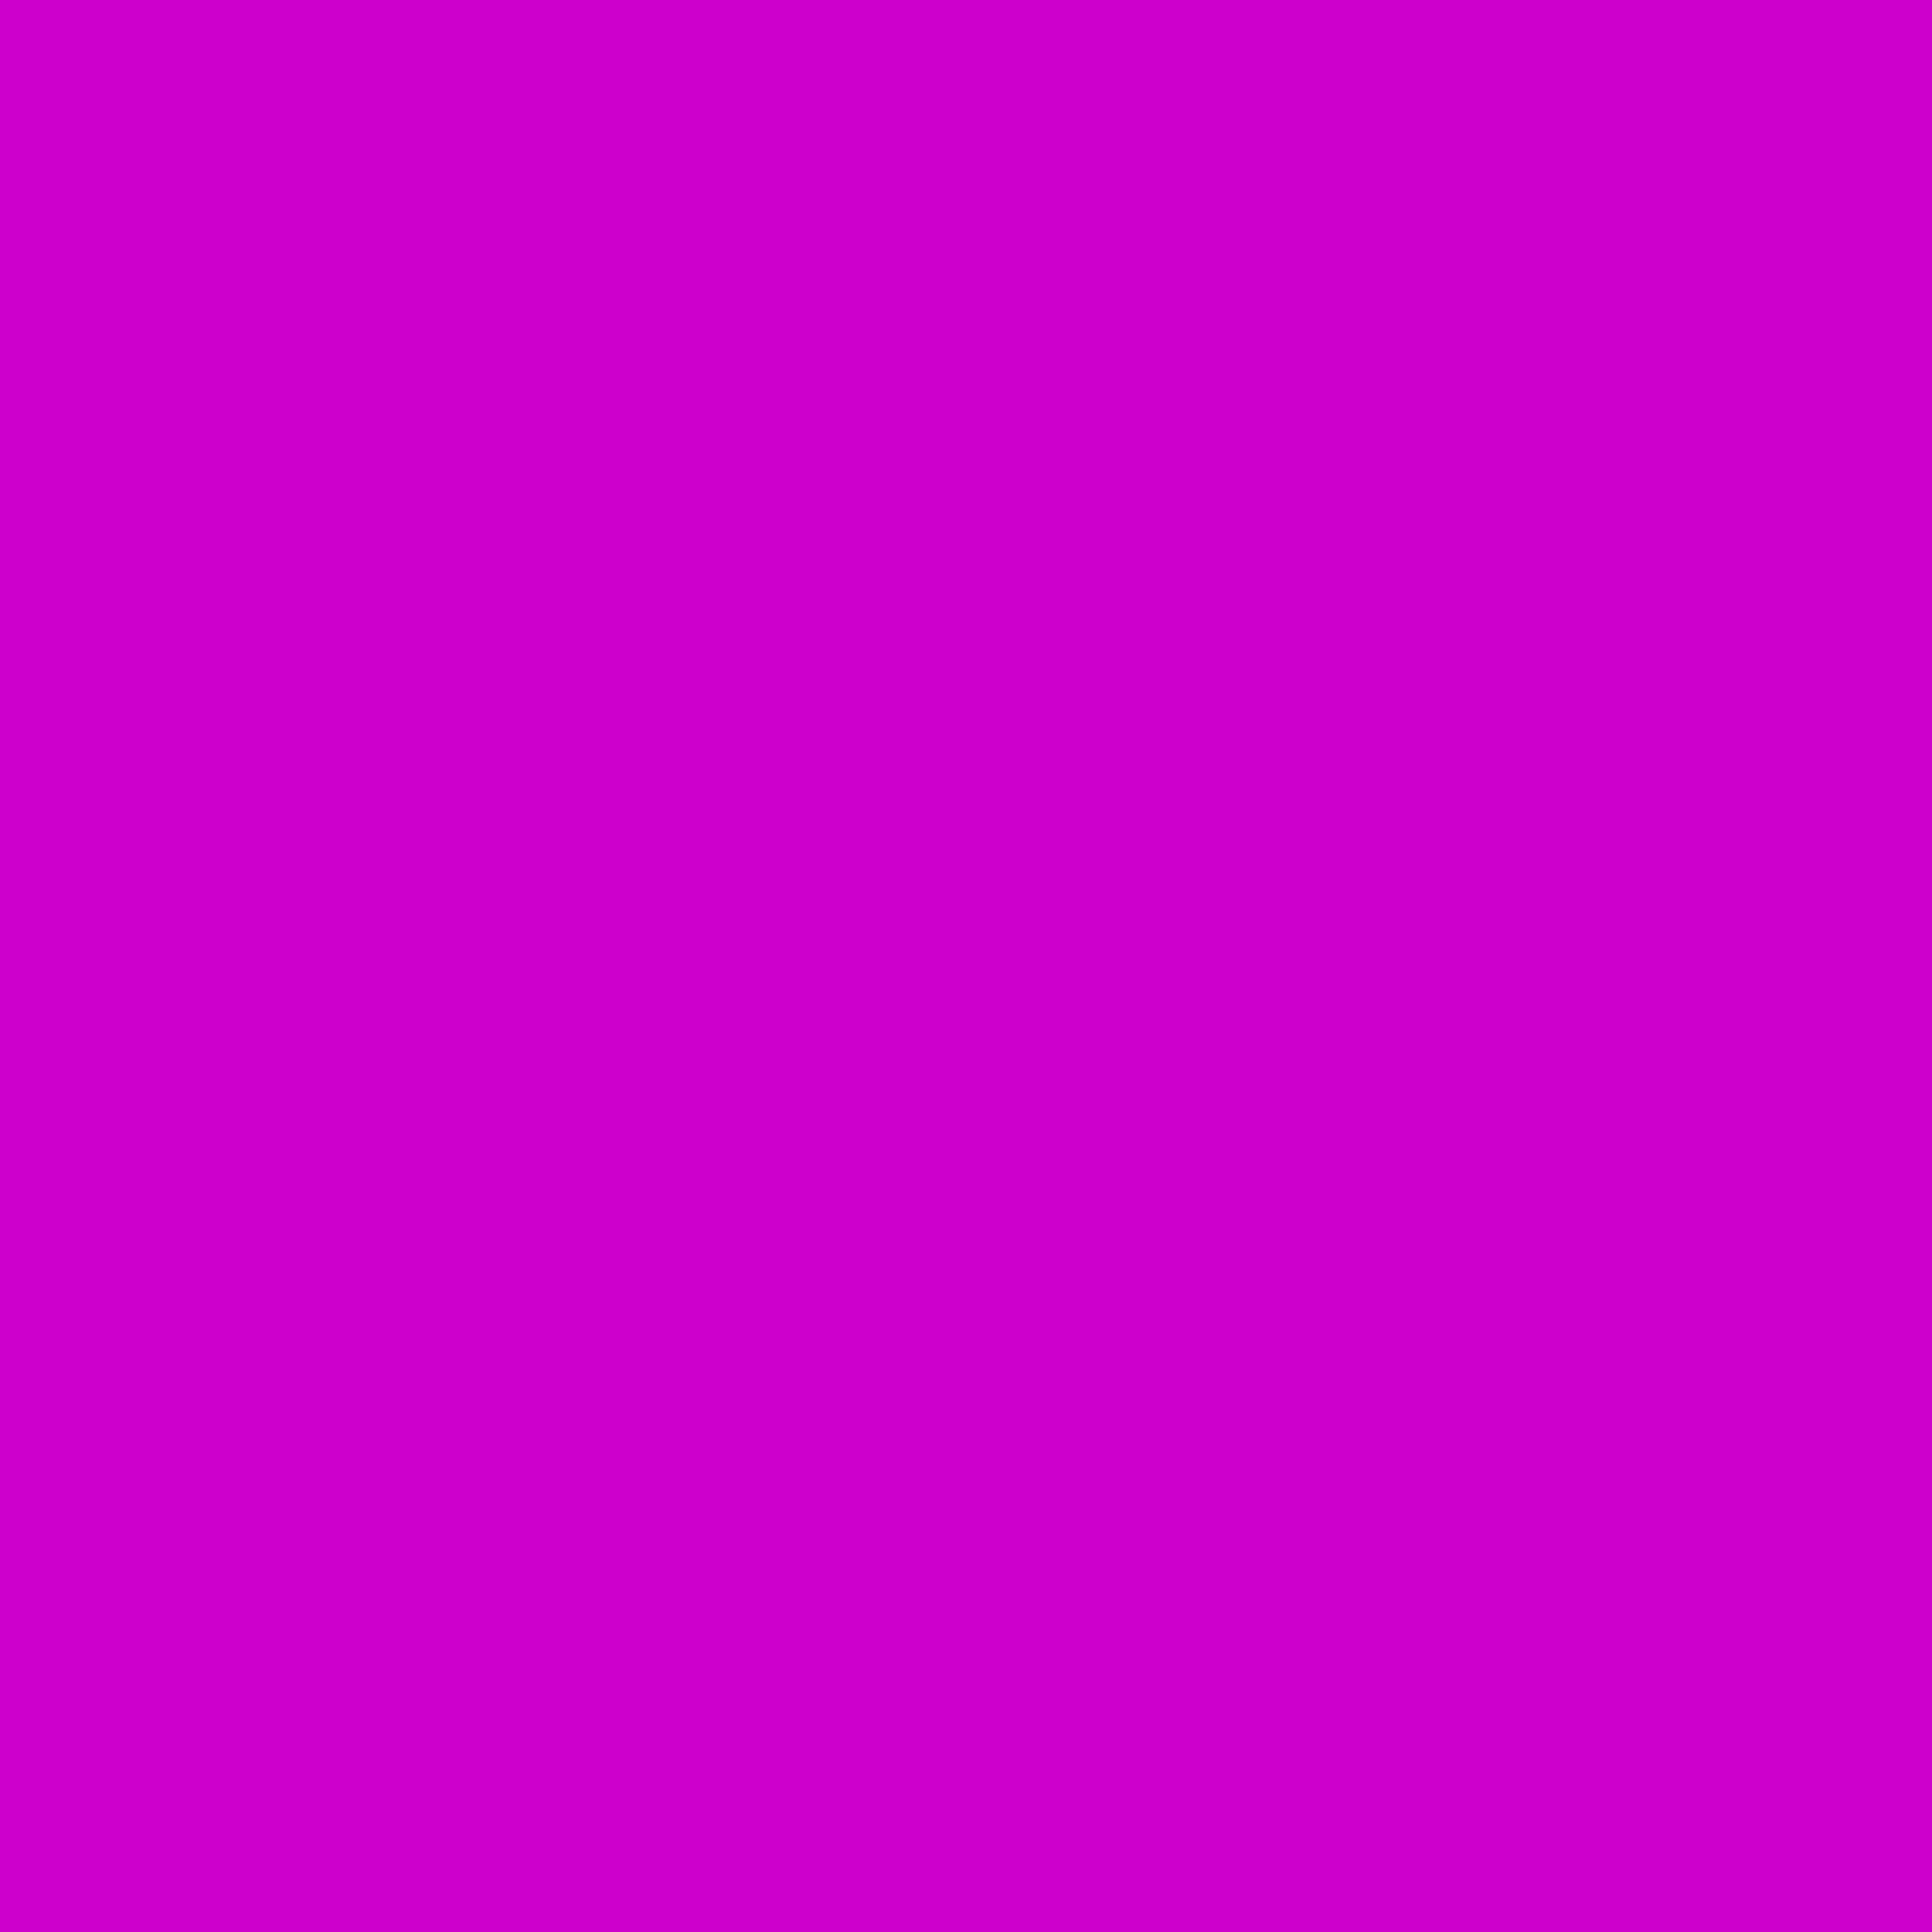 2732x2732 Deep Magenta Solid Color Background